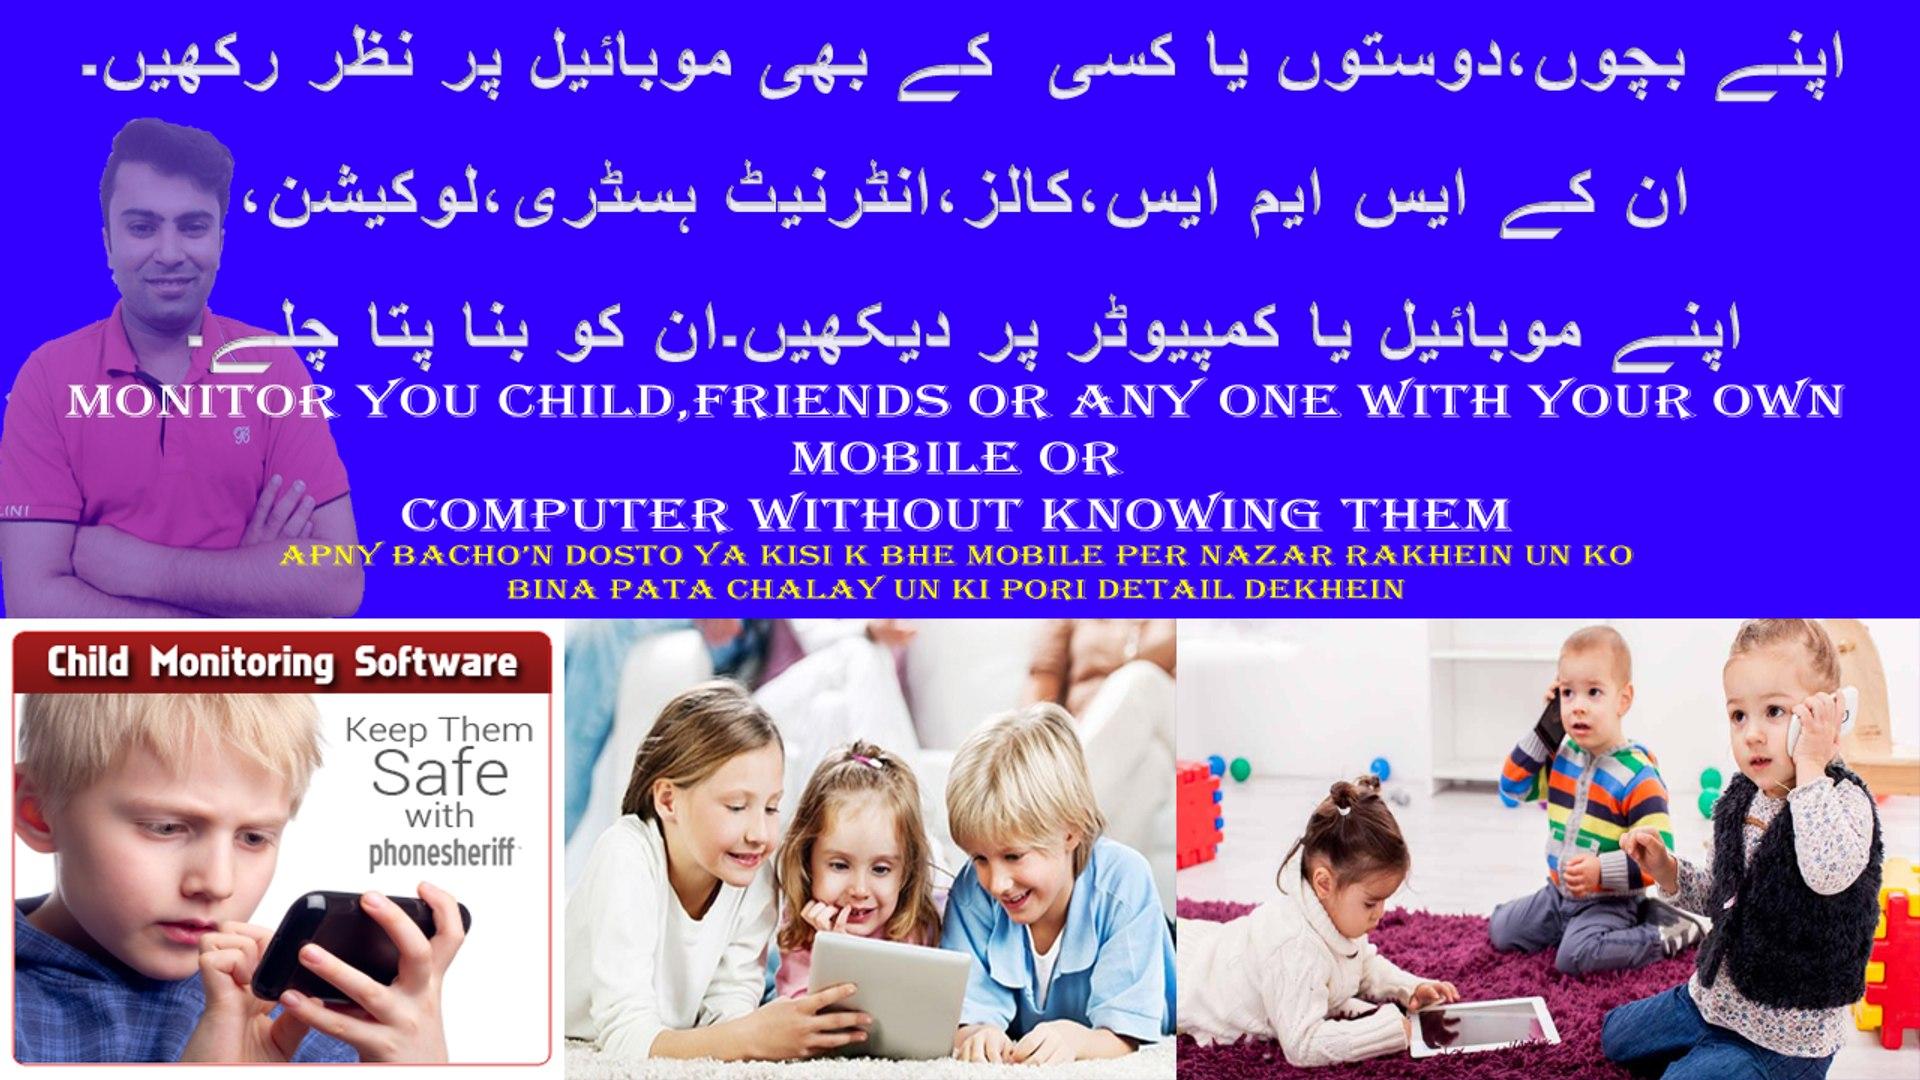 Monitor Your kids - employee without knowing them [SpyHuman] Urdu - Hindi